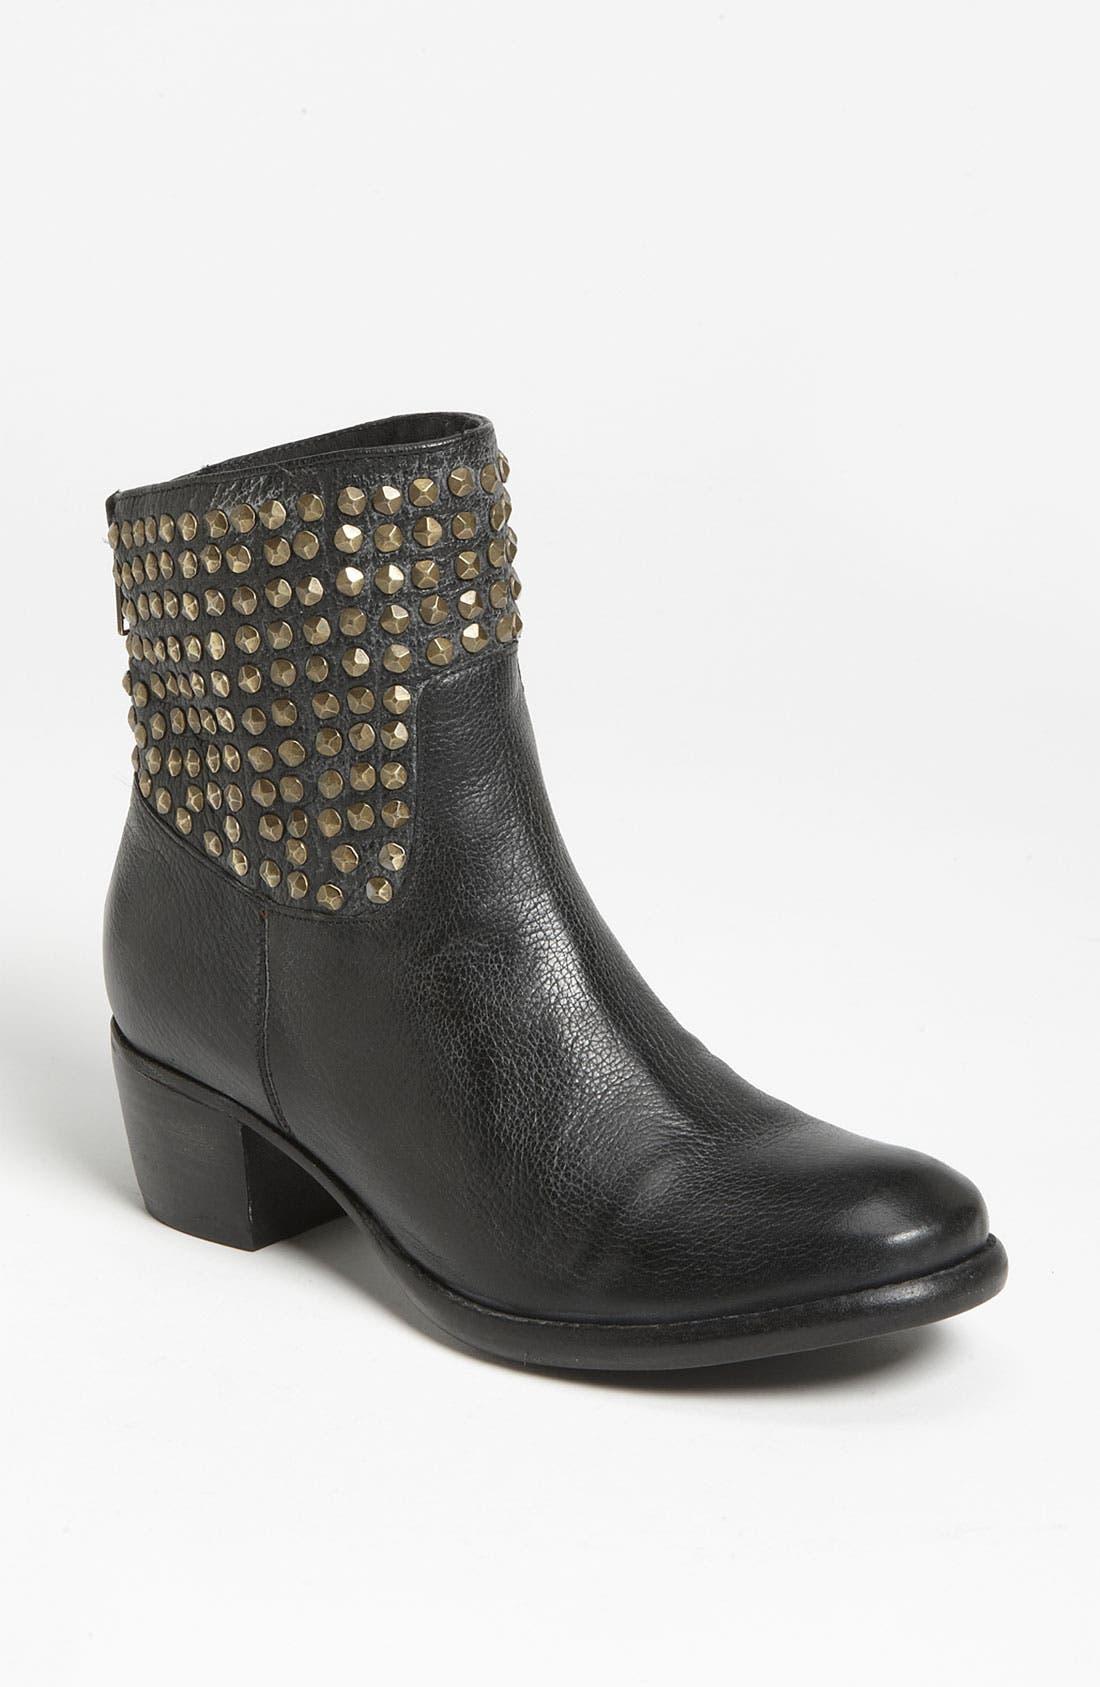 Main Image - Dolce Vita 'Mella' Boot